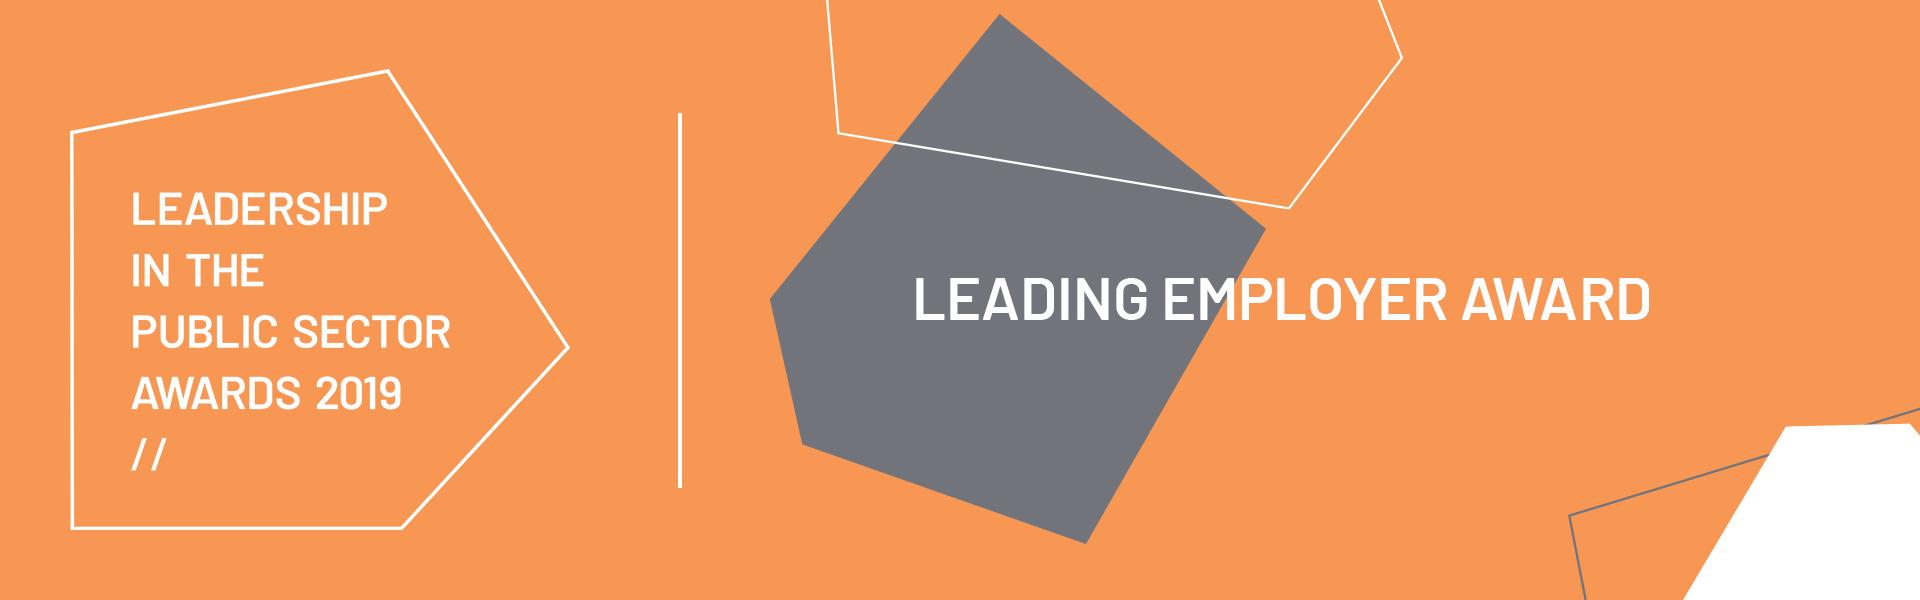 Leading Employer Award_1920x600_V1.jpg